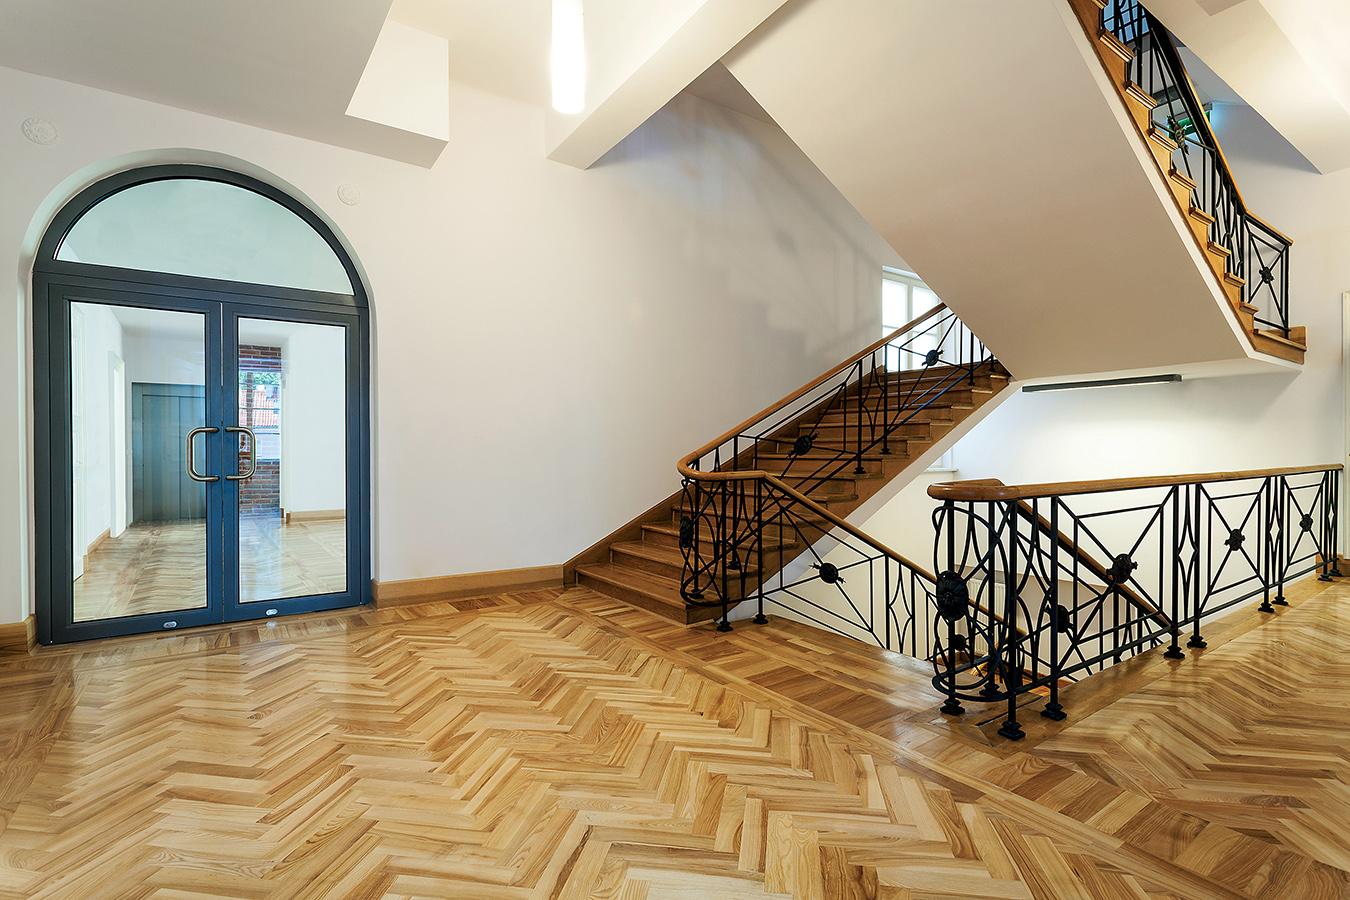 Jaseňové drevené podlahy